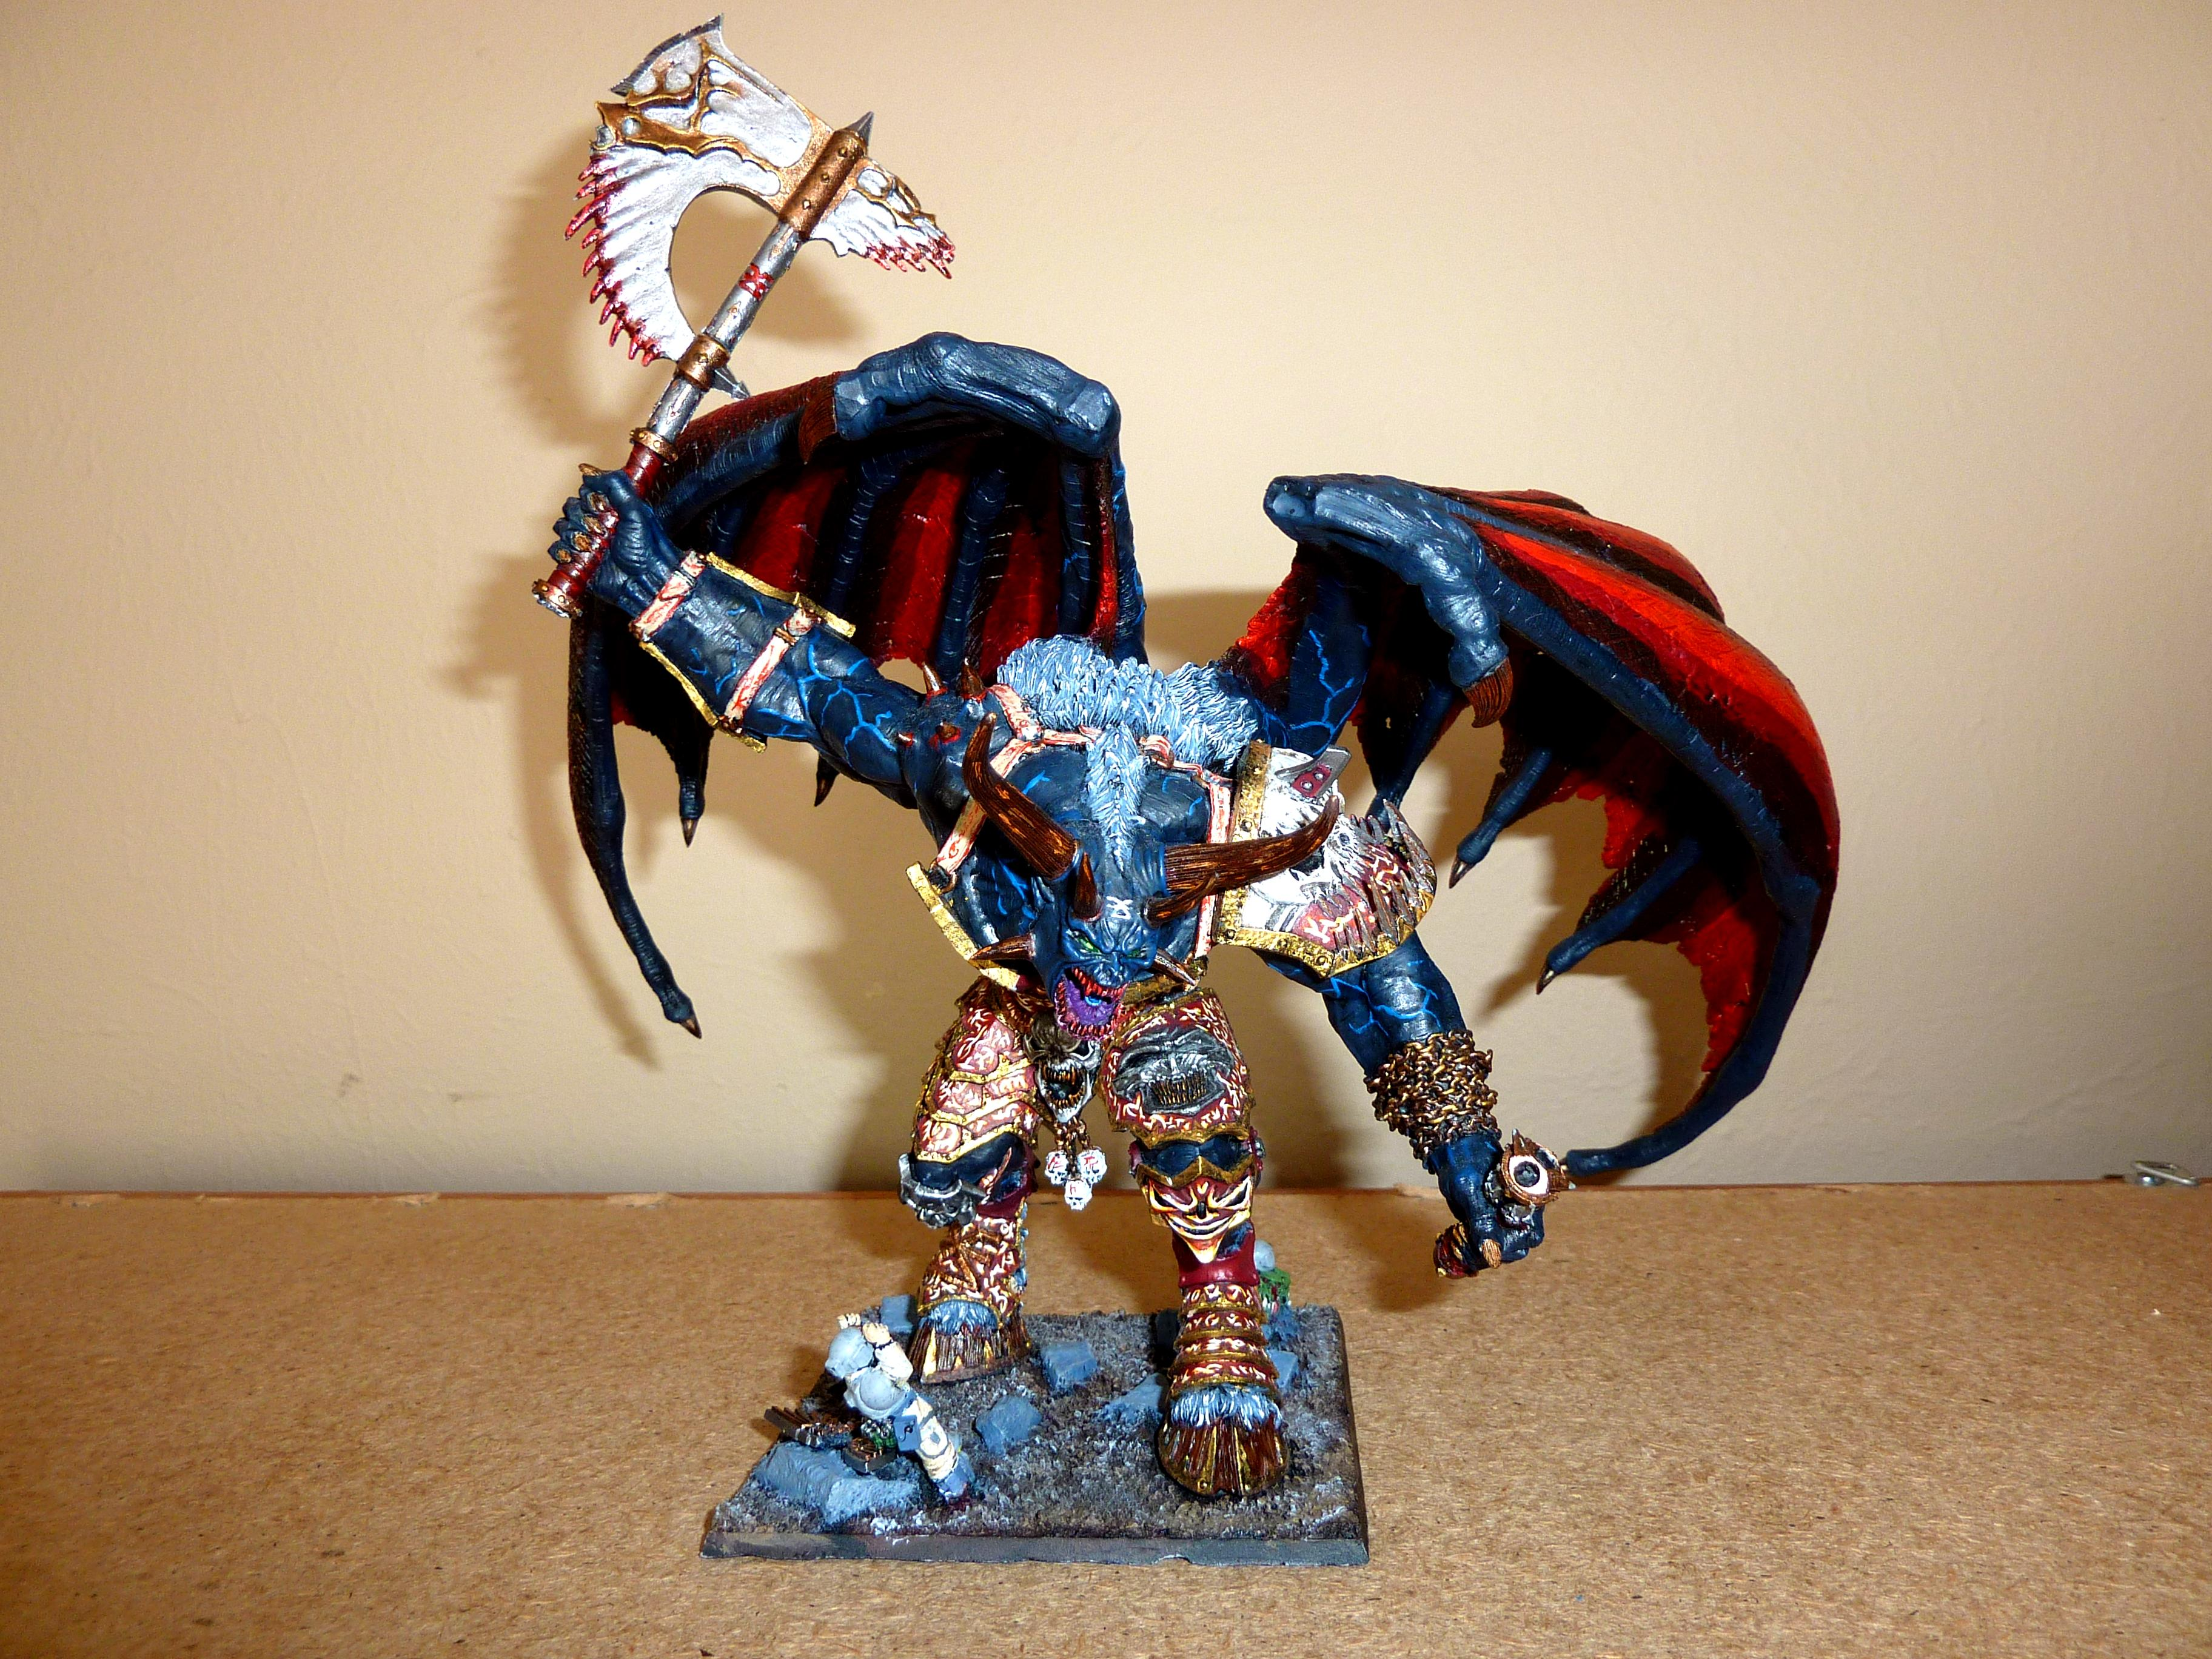 An'ggrath The Unbound, Bloodthirster, Chaos, Chaos Daemons, Daemons, Forge World, Gargantuan Creature, Khorne